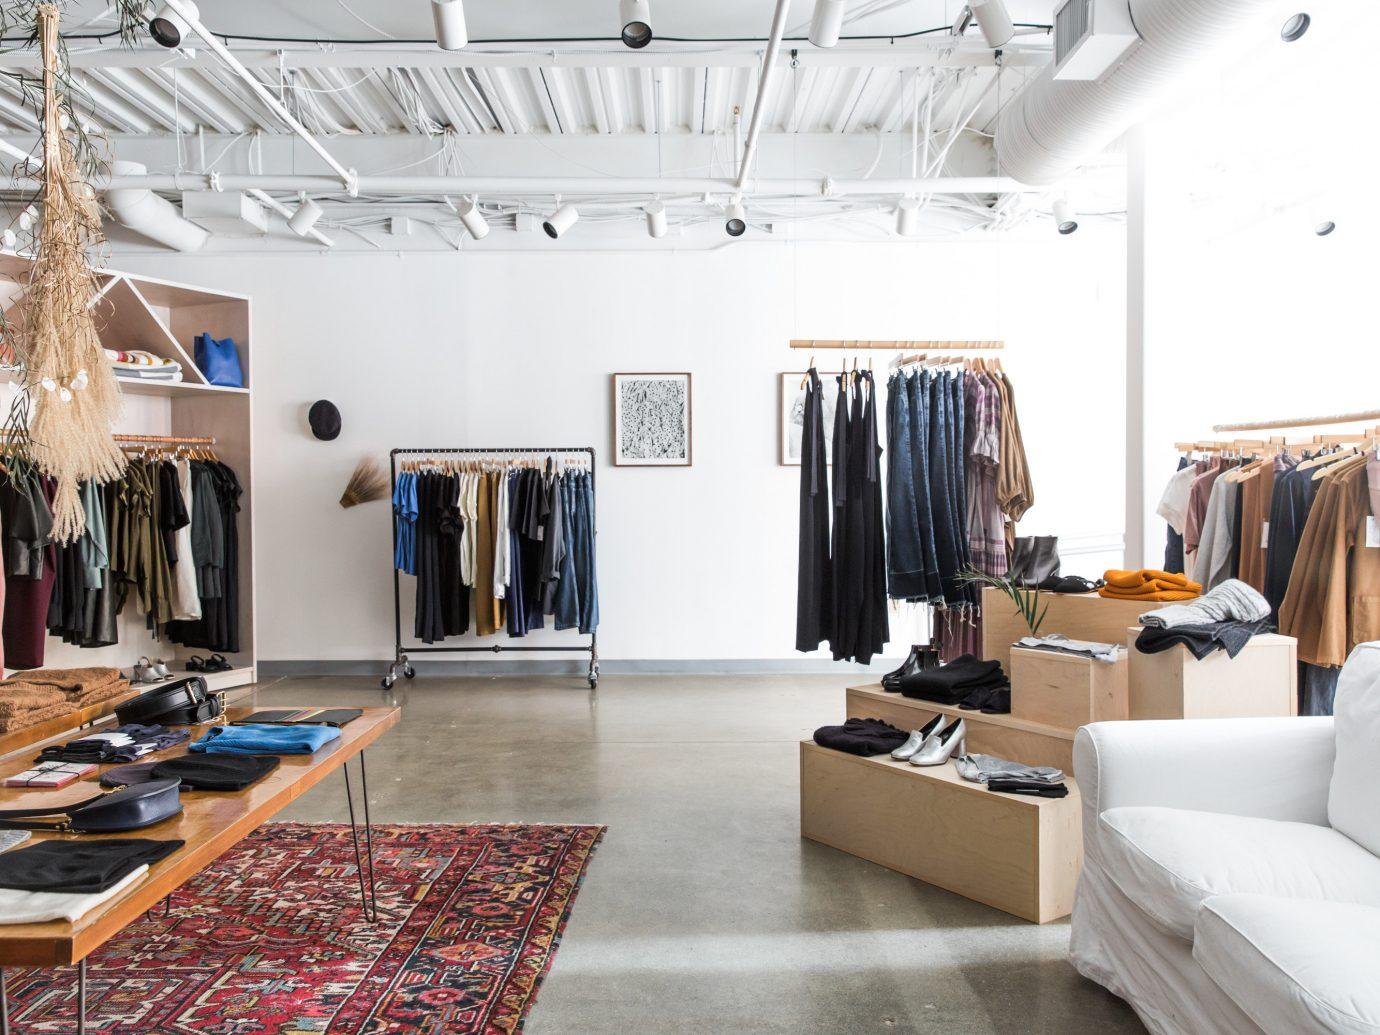 Influencers + Tastemakers indoor floor room Boutique ceiling interior design flooring retail loft buyer furniture area several